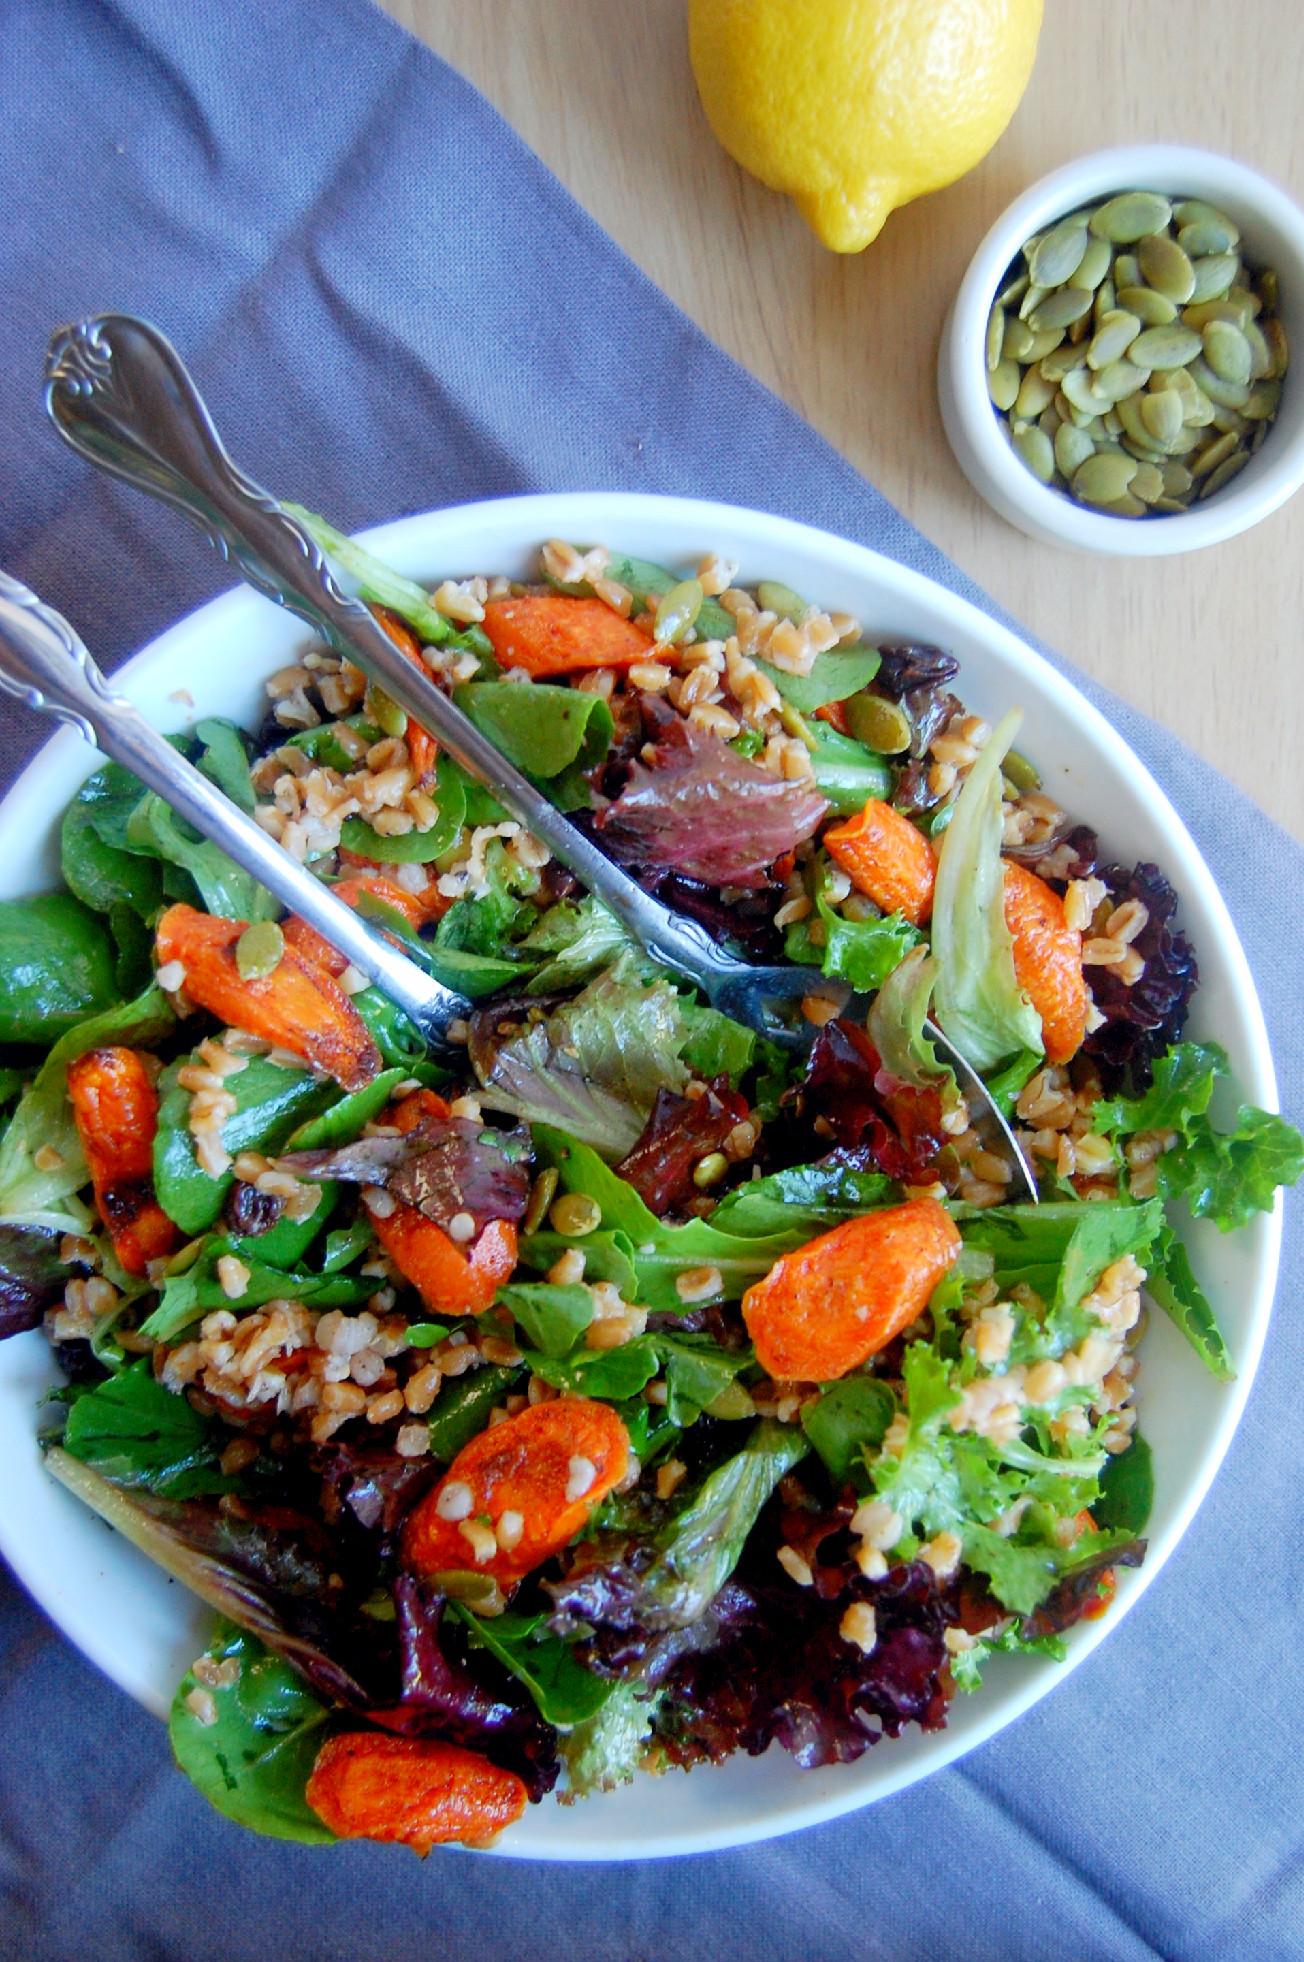 Cinnamon Roasted Carrot and Farro Salad | Uproot Kitchen